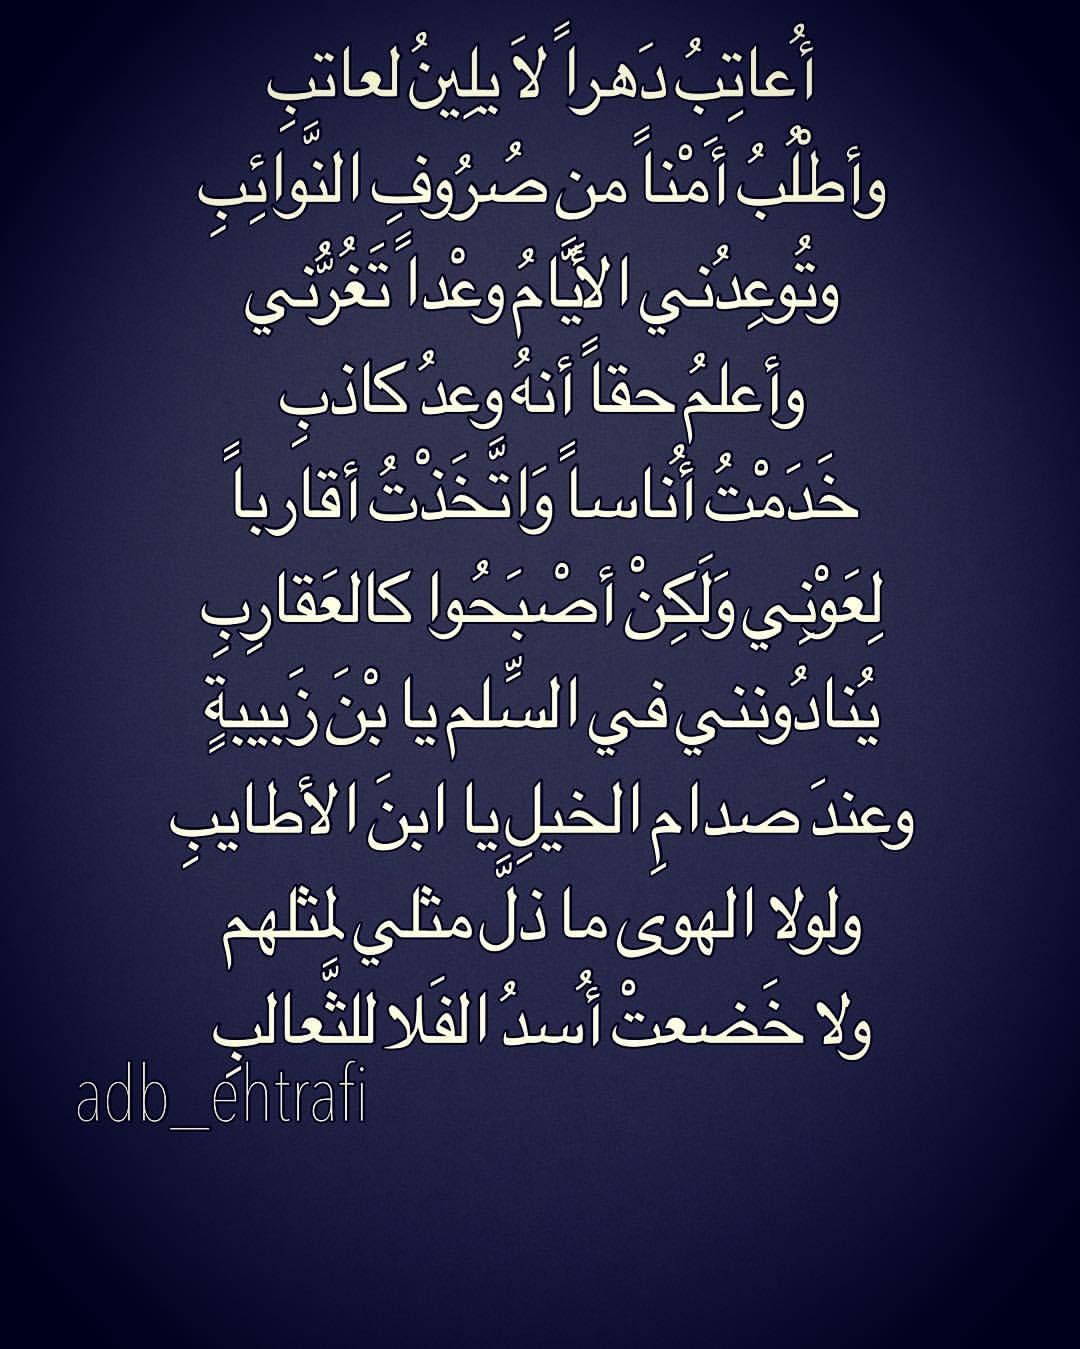 عنترة بن شداد Cool Words Pretty Words Arabic Love Quotes